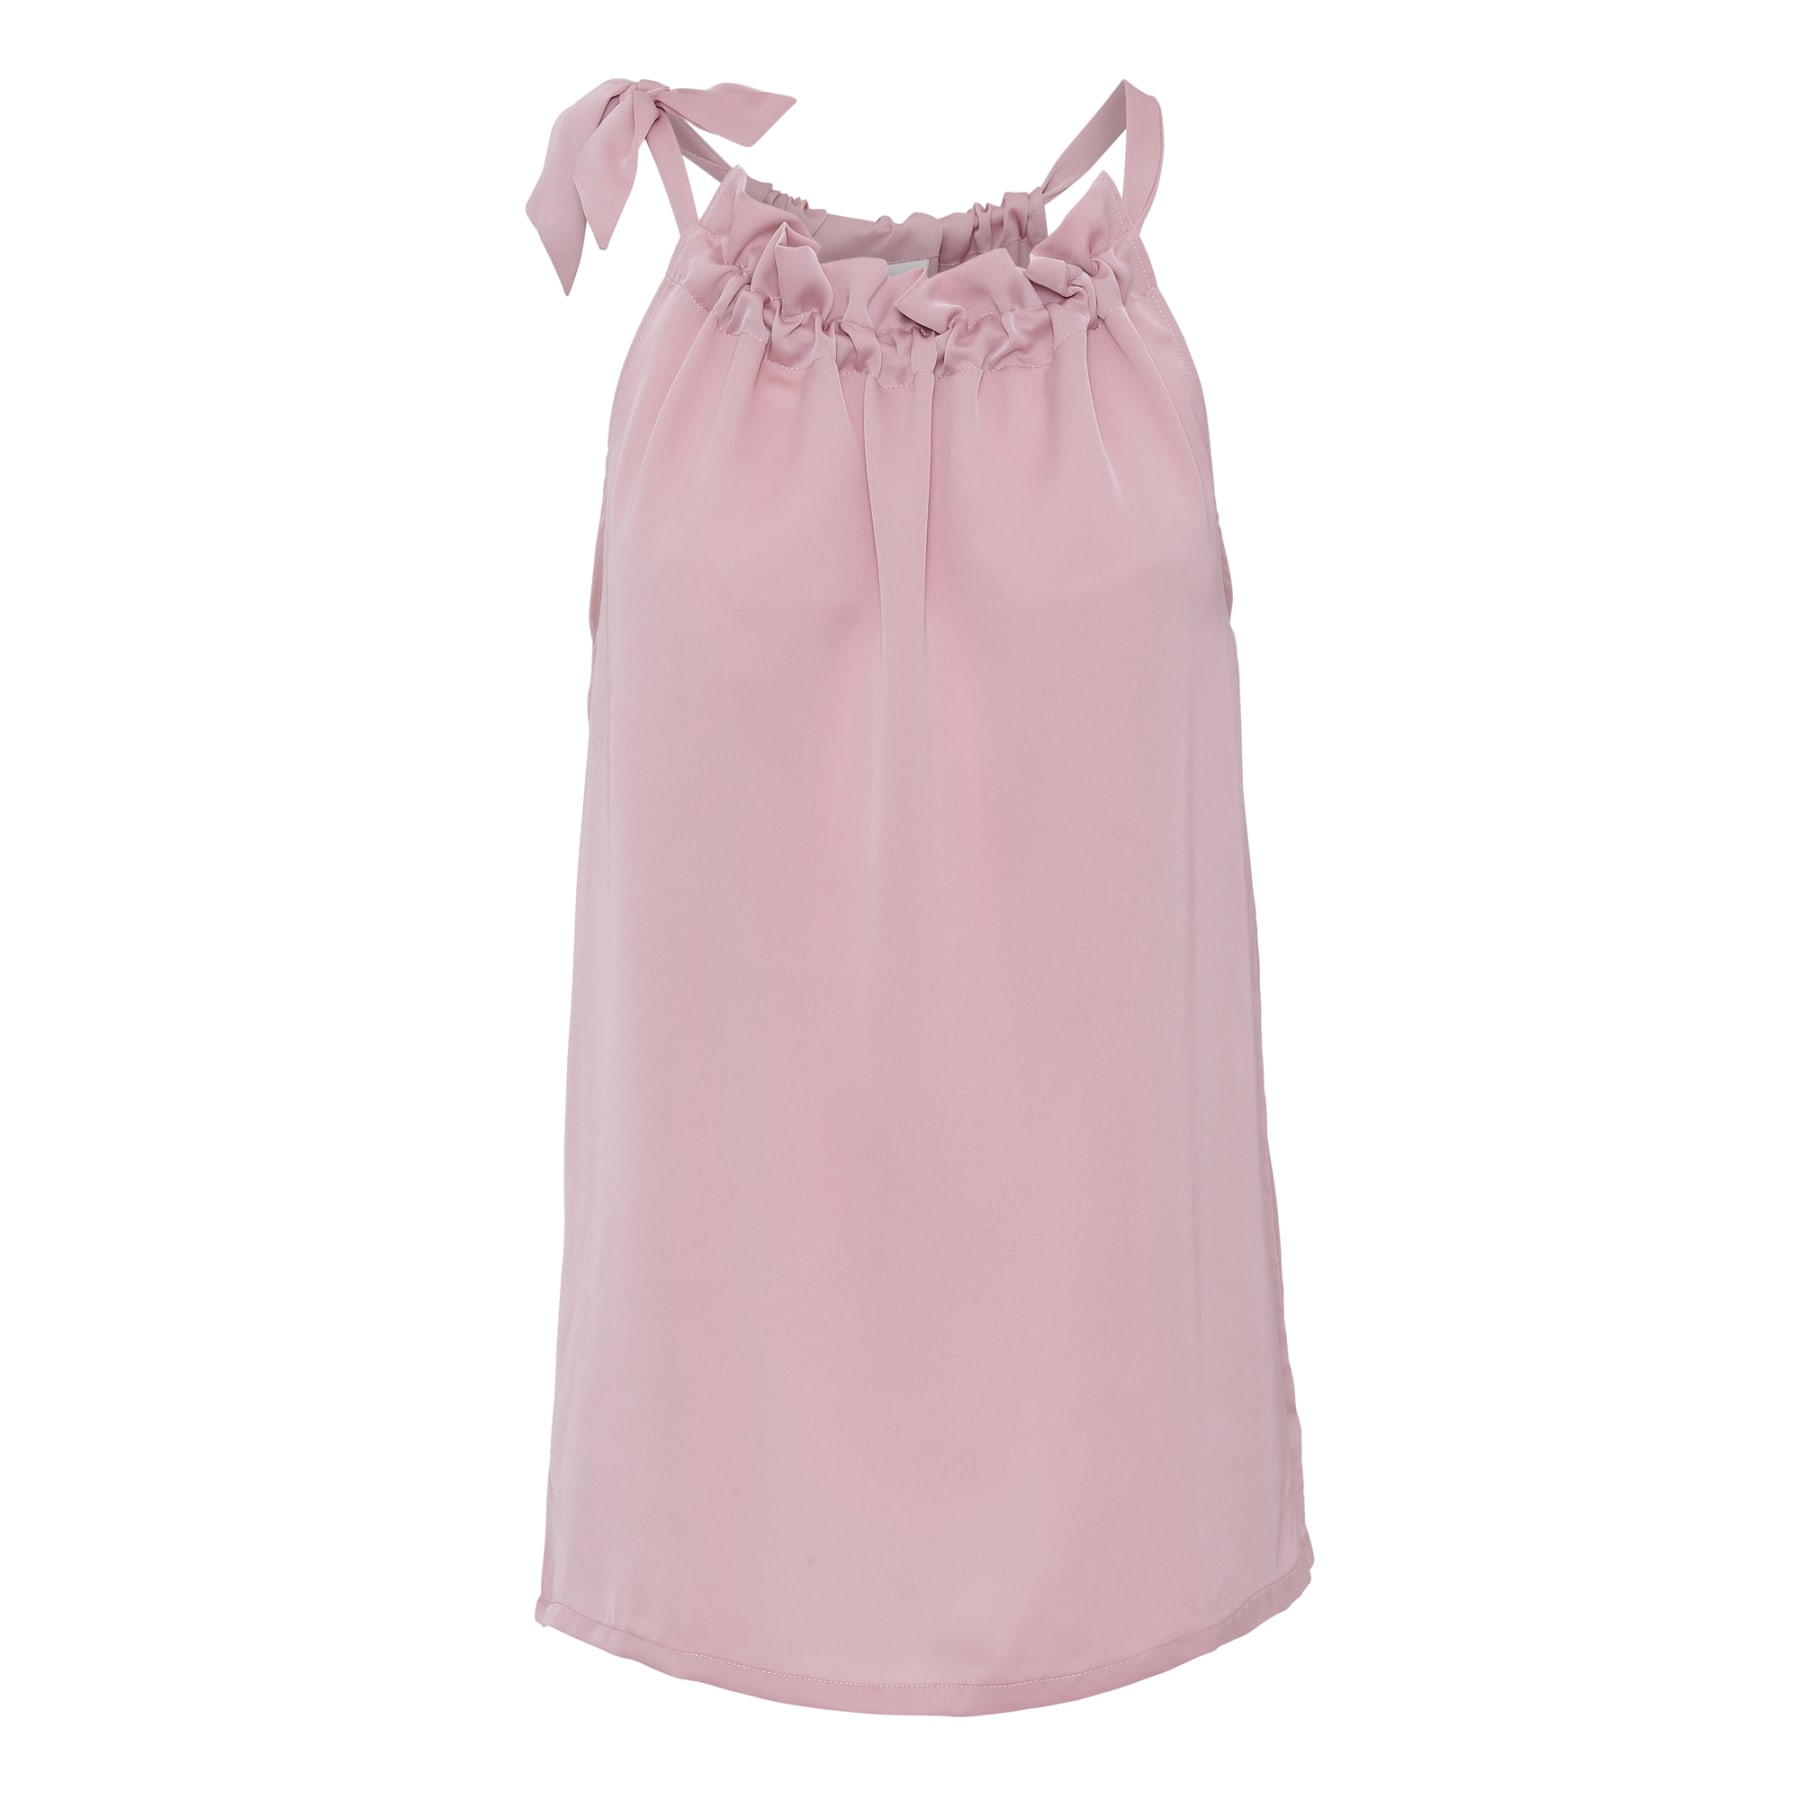 Ballet Pink Ruffle Tie Top KARMAMIA IMAGE BY ME